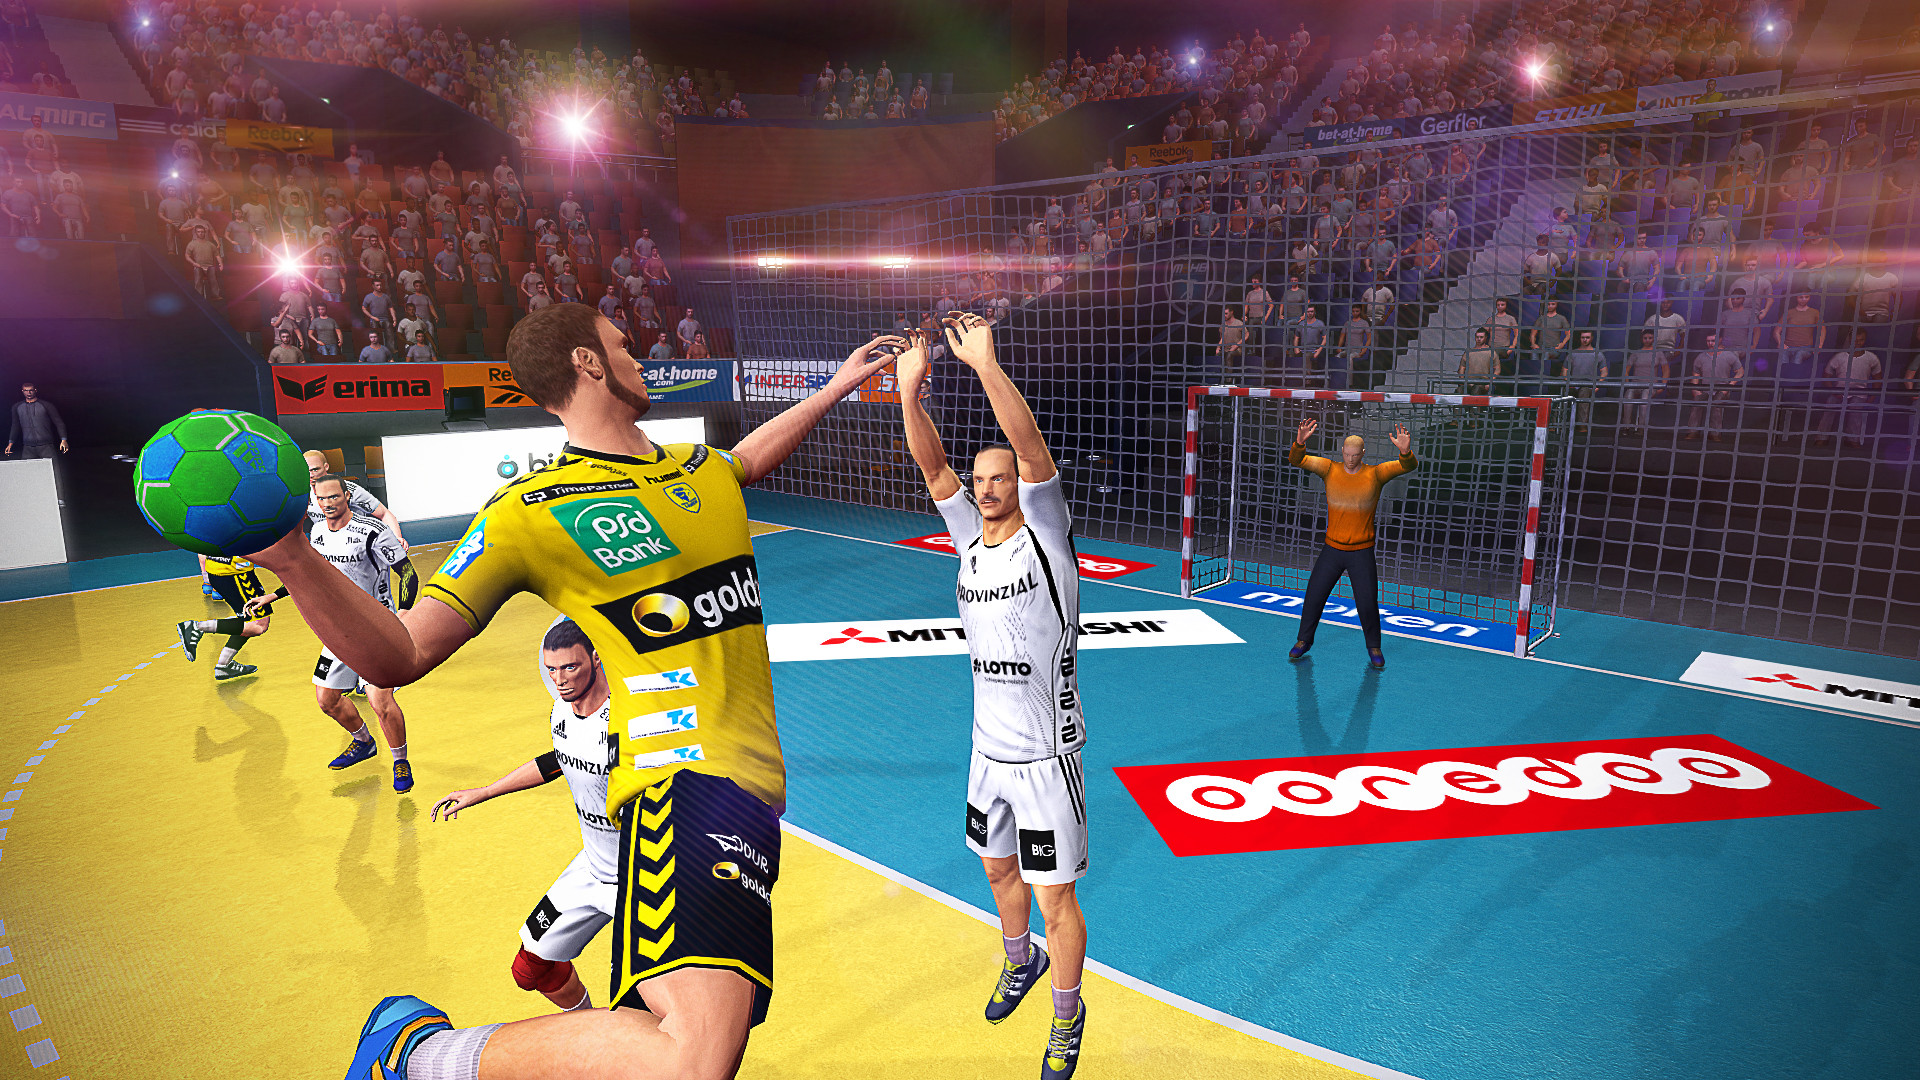 Game Fix Crack Handball 16 V10 All No DVD Codex